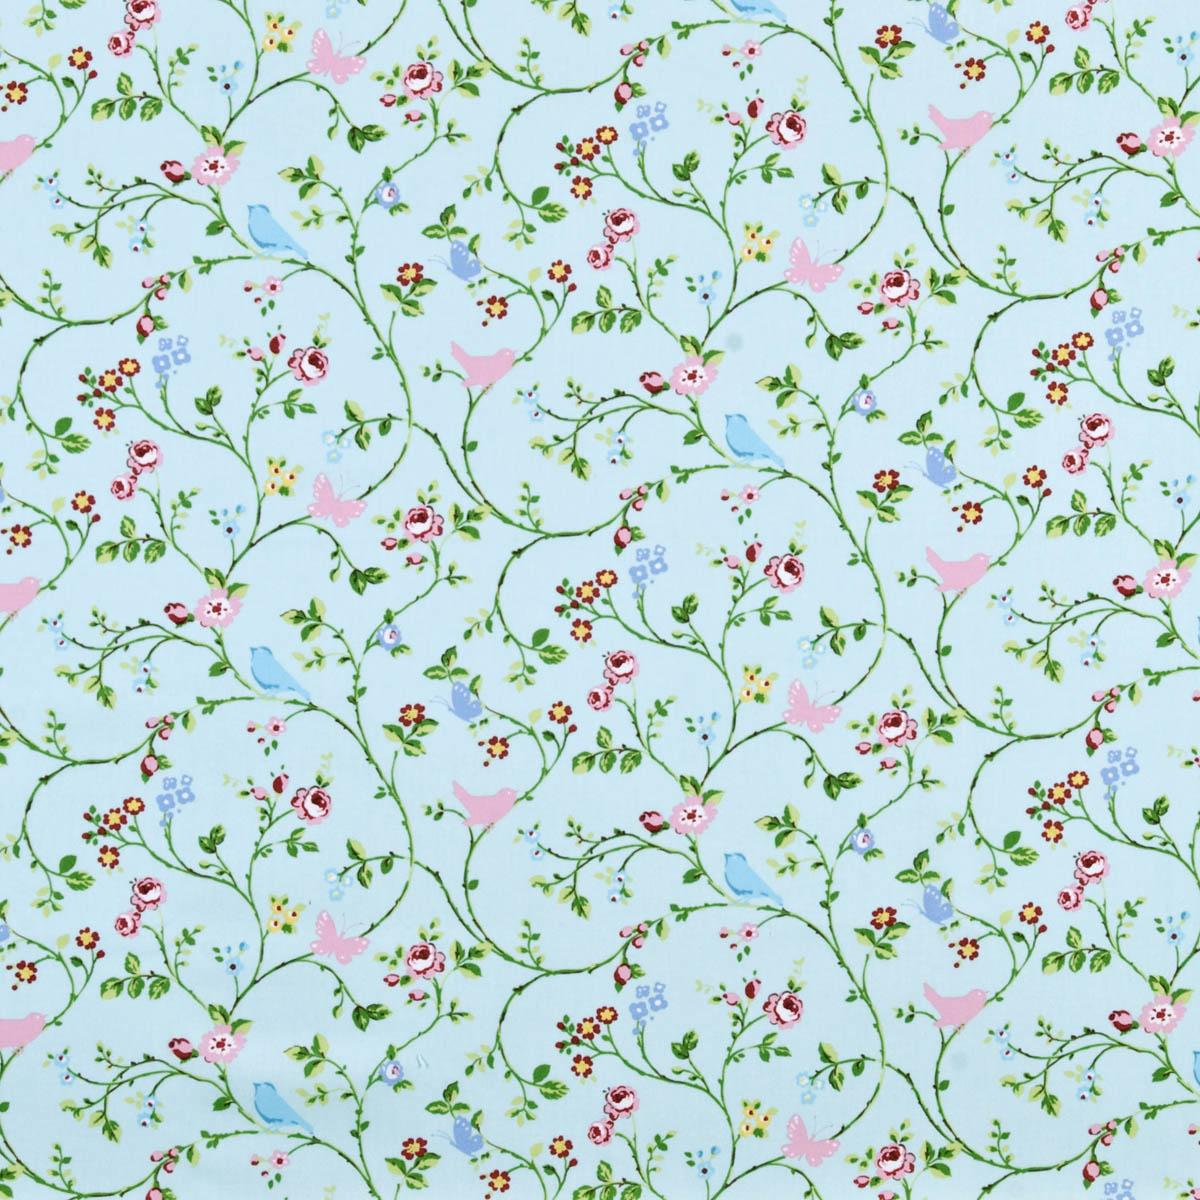 Bird Trail Curtain Fabric Seafoam Printed Fabric In Pink